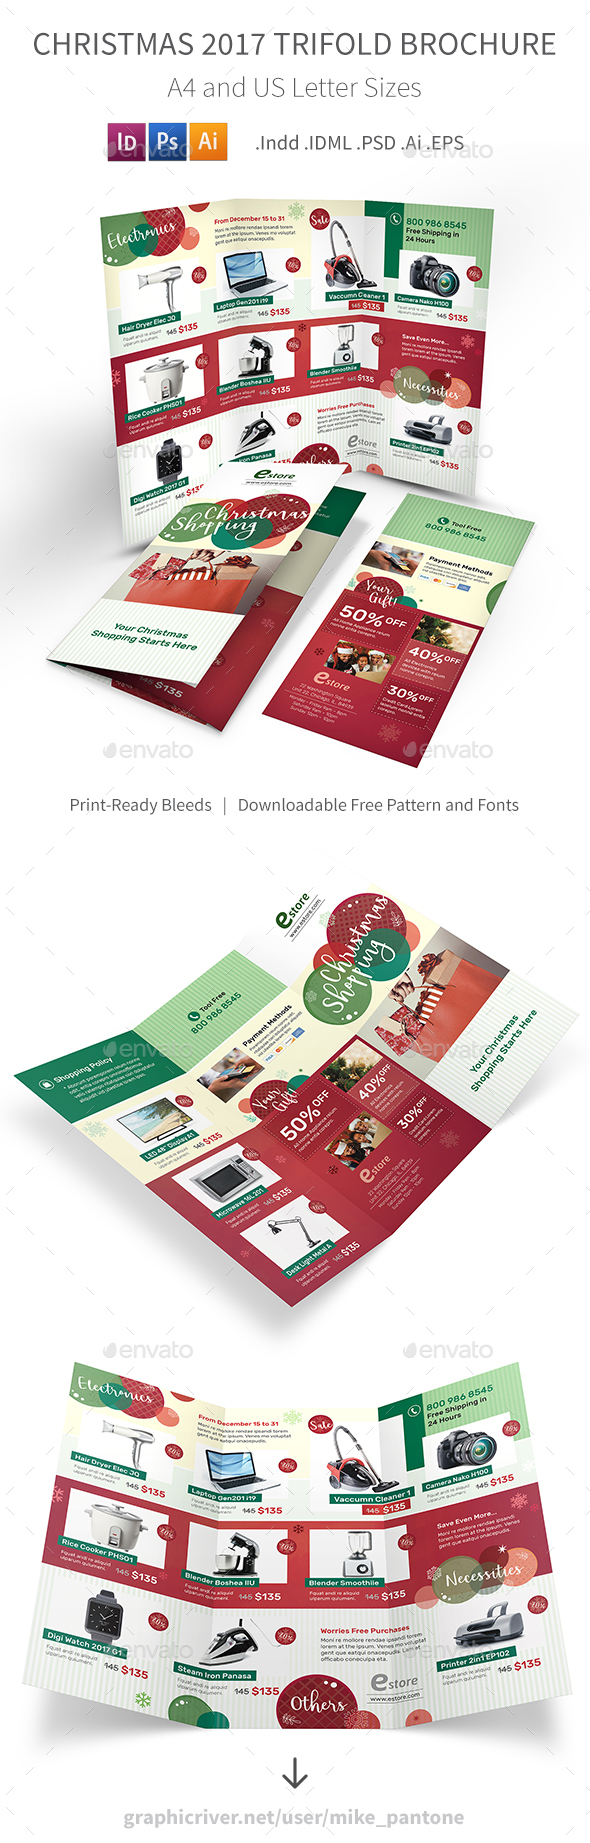 GraphicRiver Christmas 2017 Trifold Brochure 20944377